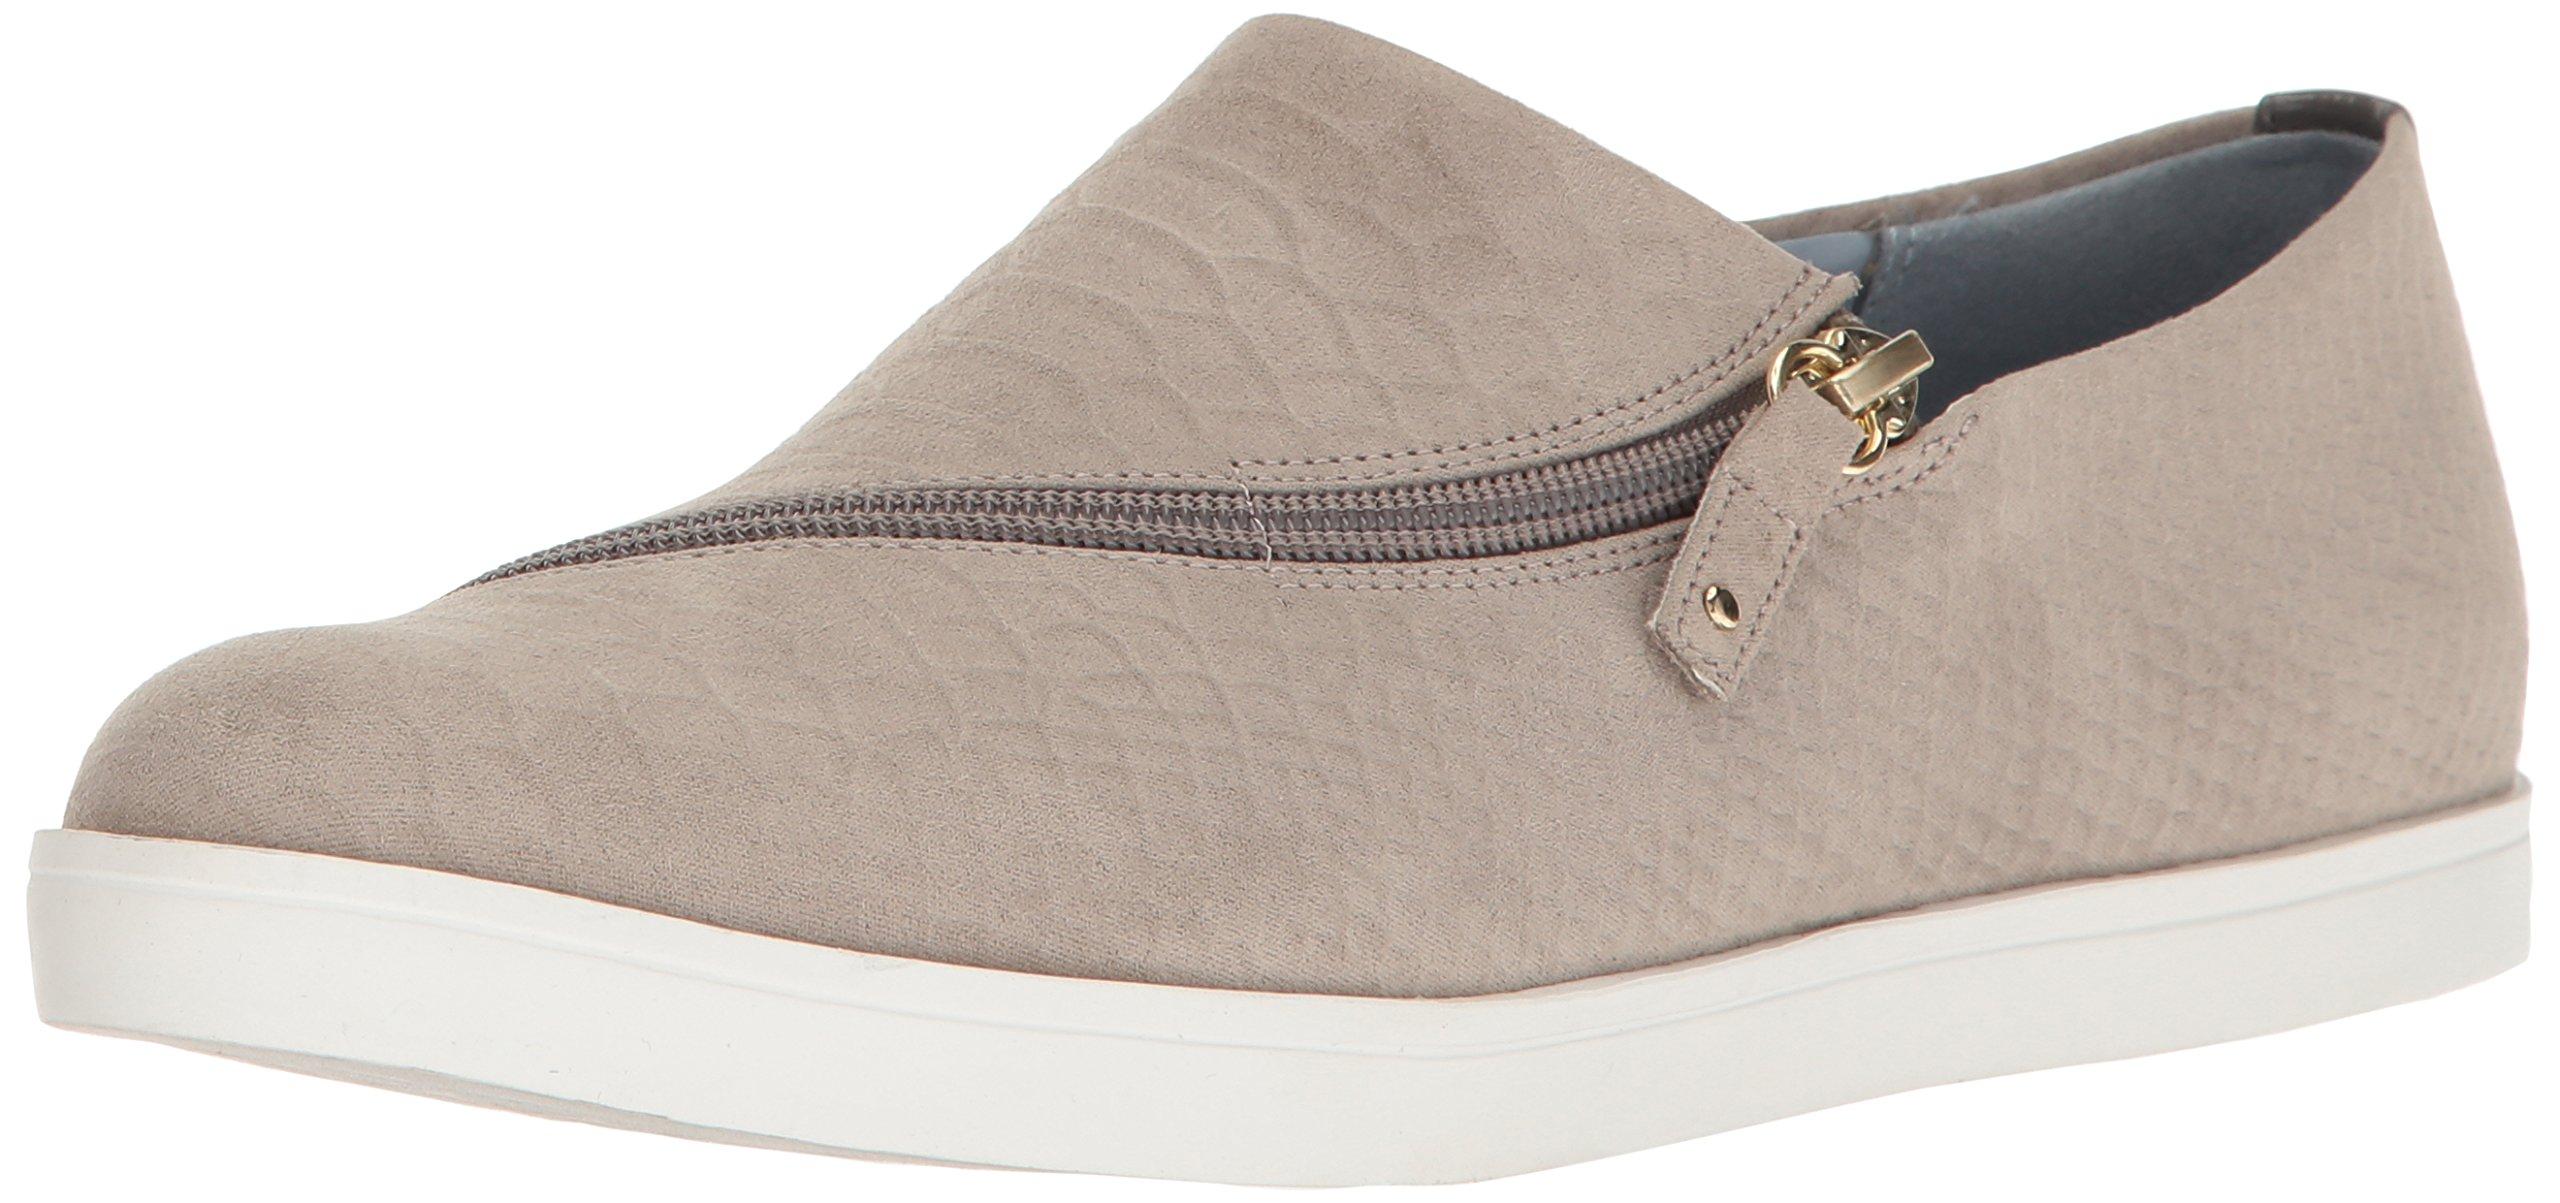 Dr. Scholl's Women's Repeat Zip Fashion Sneaker, Grey Microsuede Snake, 6.5 M US